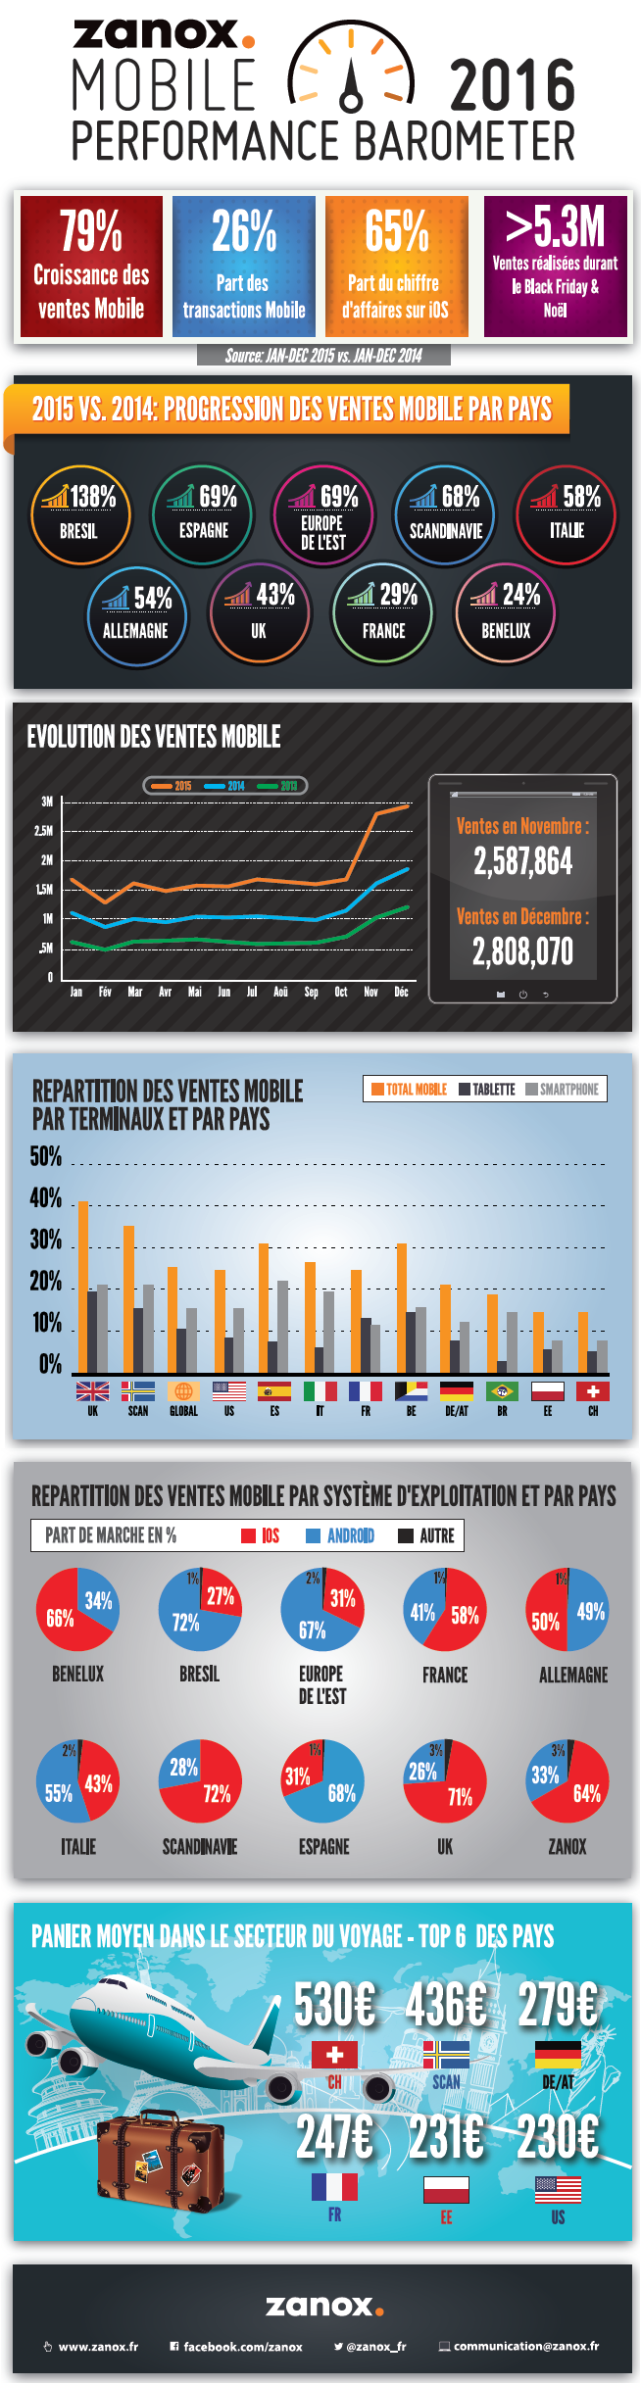 Zanox_mcommerce_infographie